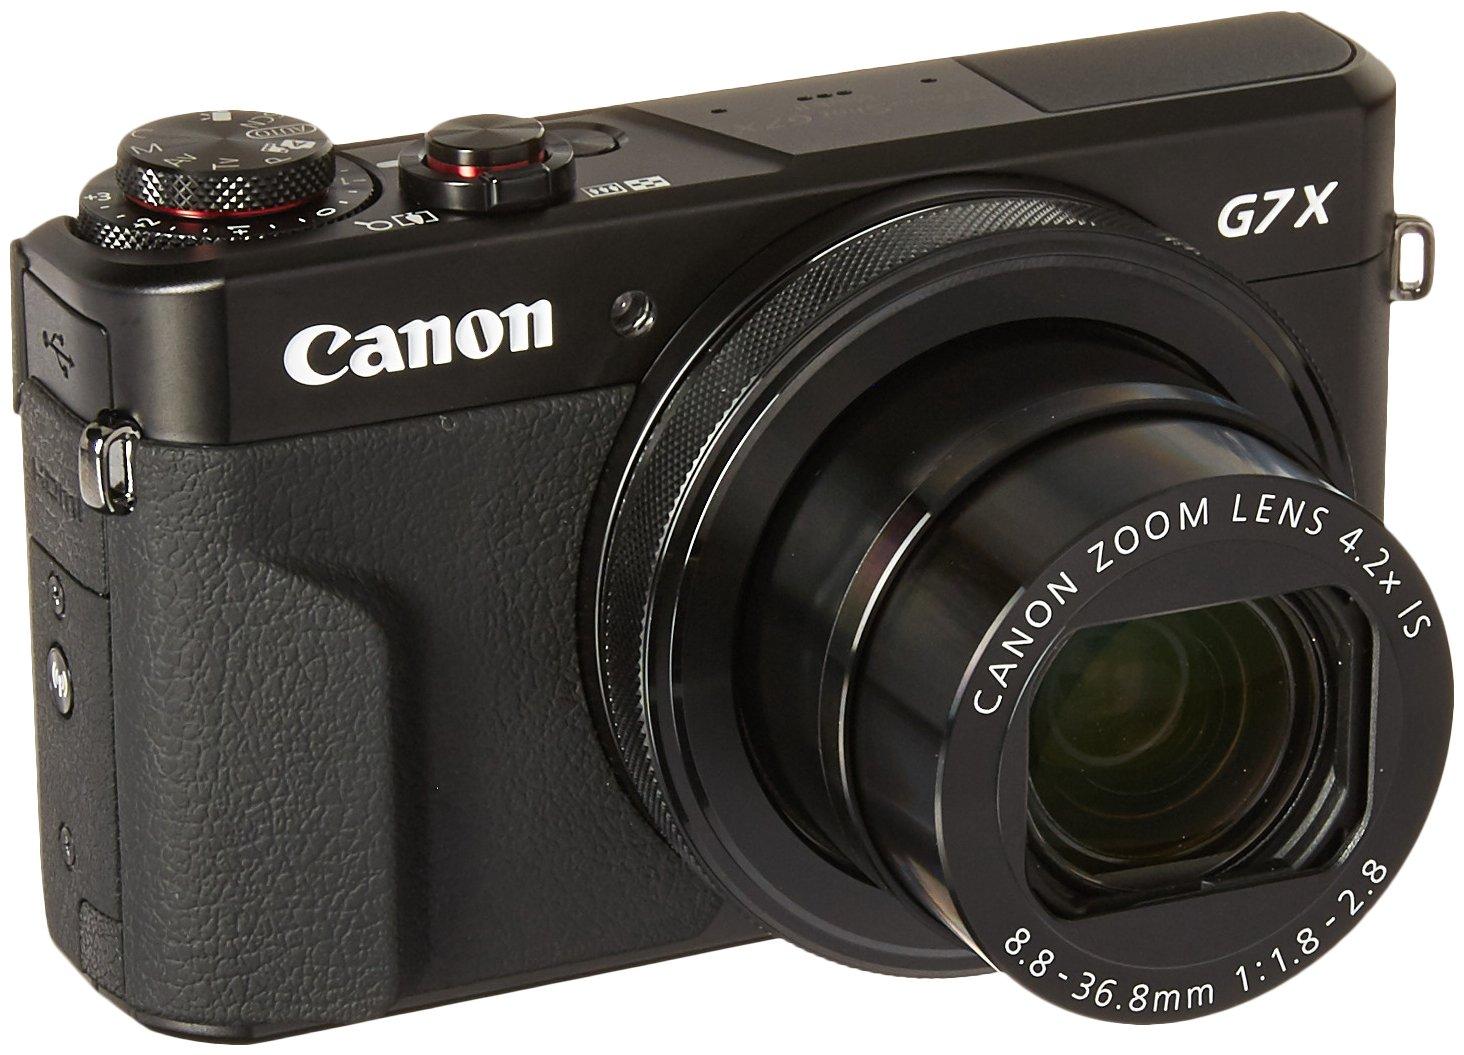 Canon G7X II